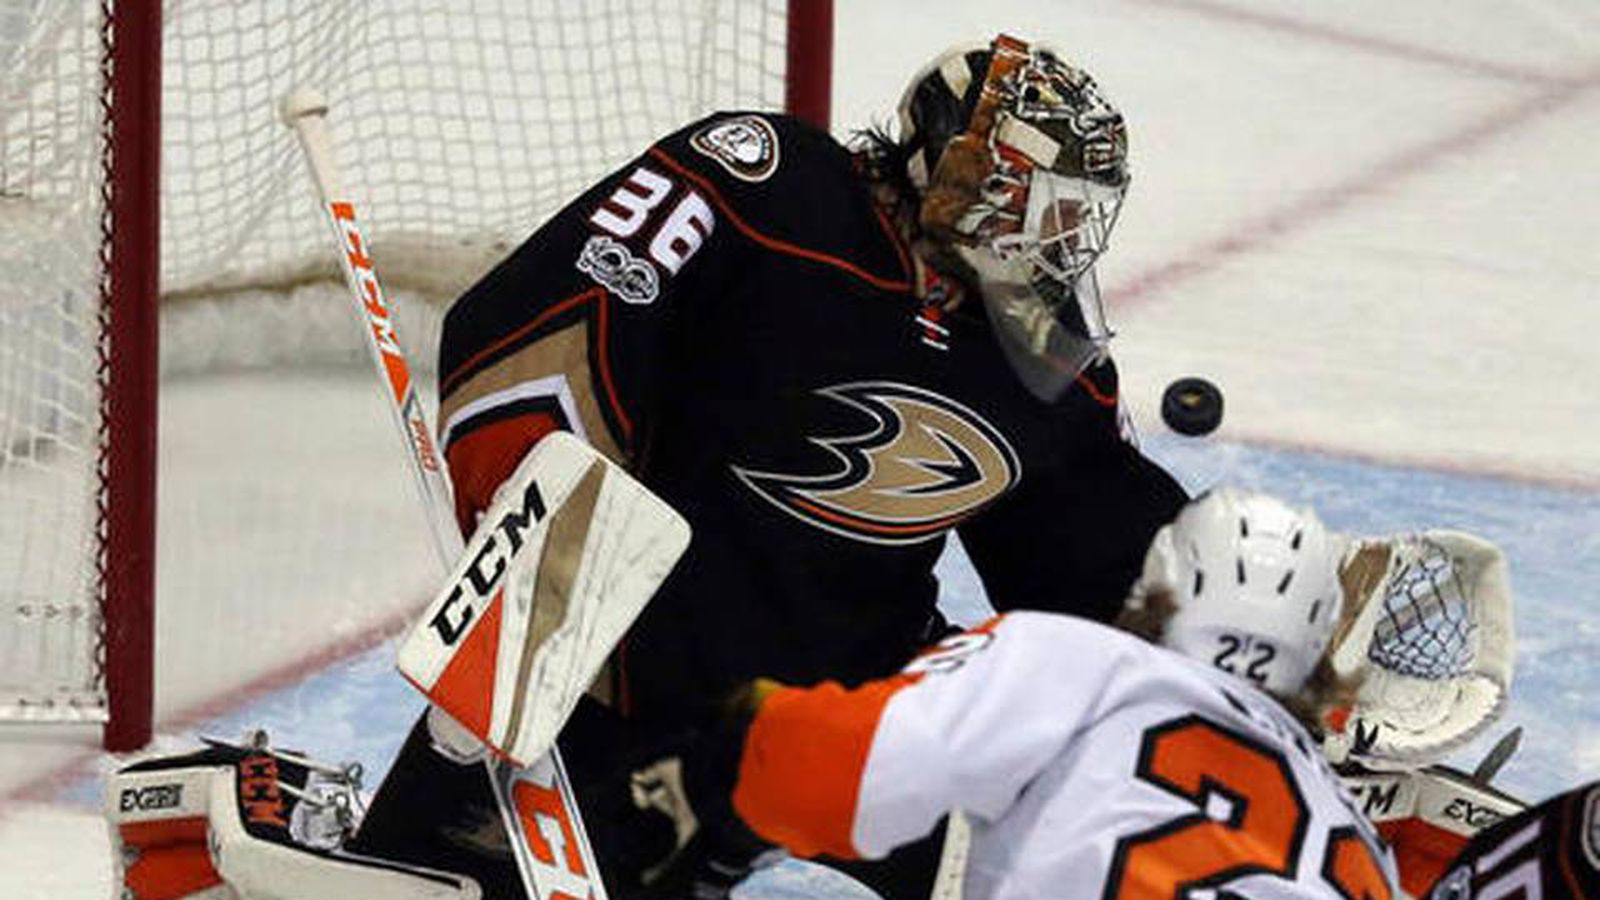 Flyers_ducks_hockey_17313.0